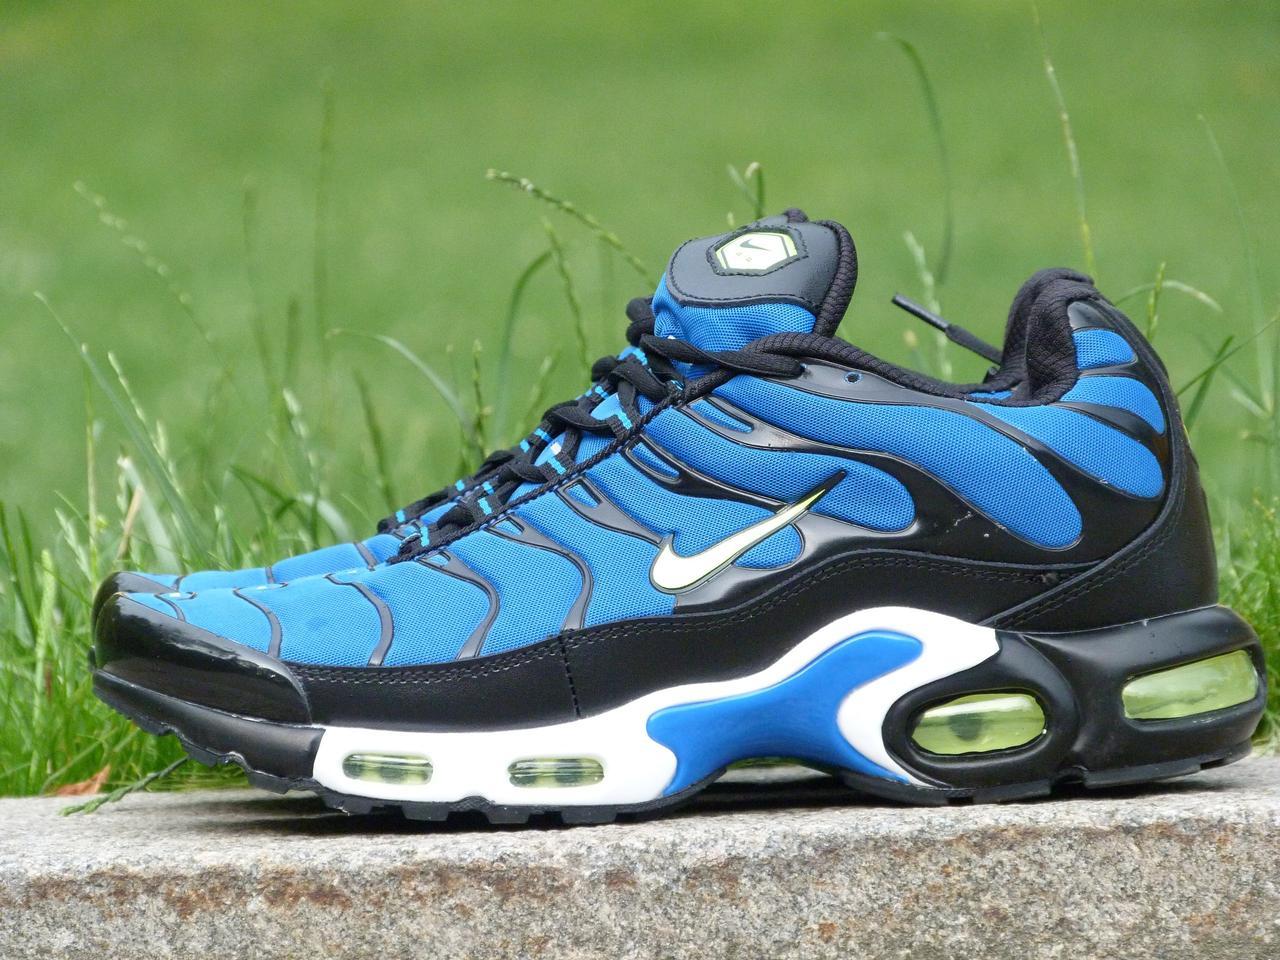 Кроссовки мужские Nike Air Max Nike Tn+ Blue топ реплика